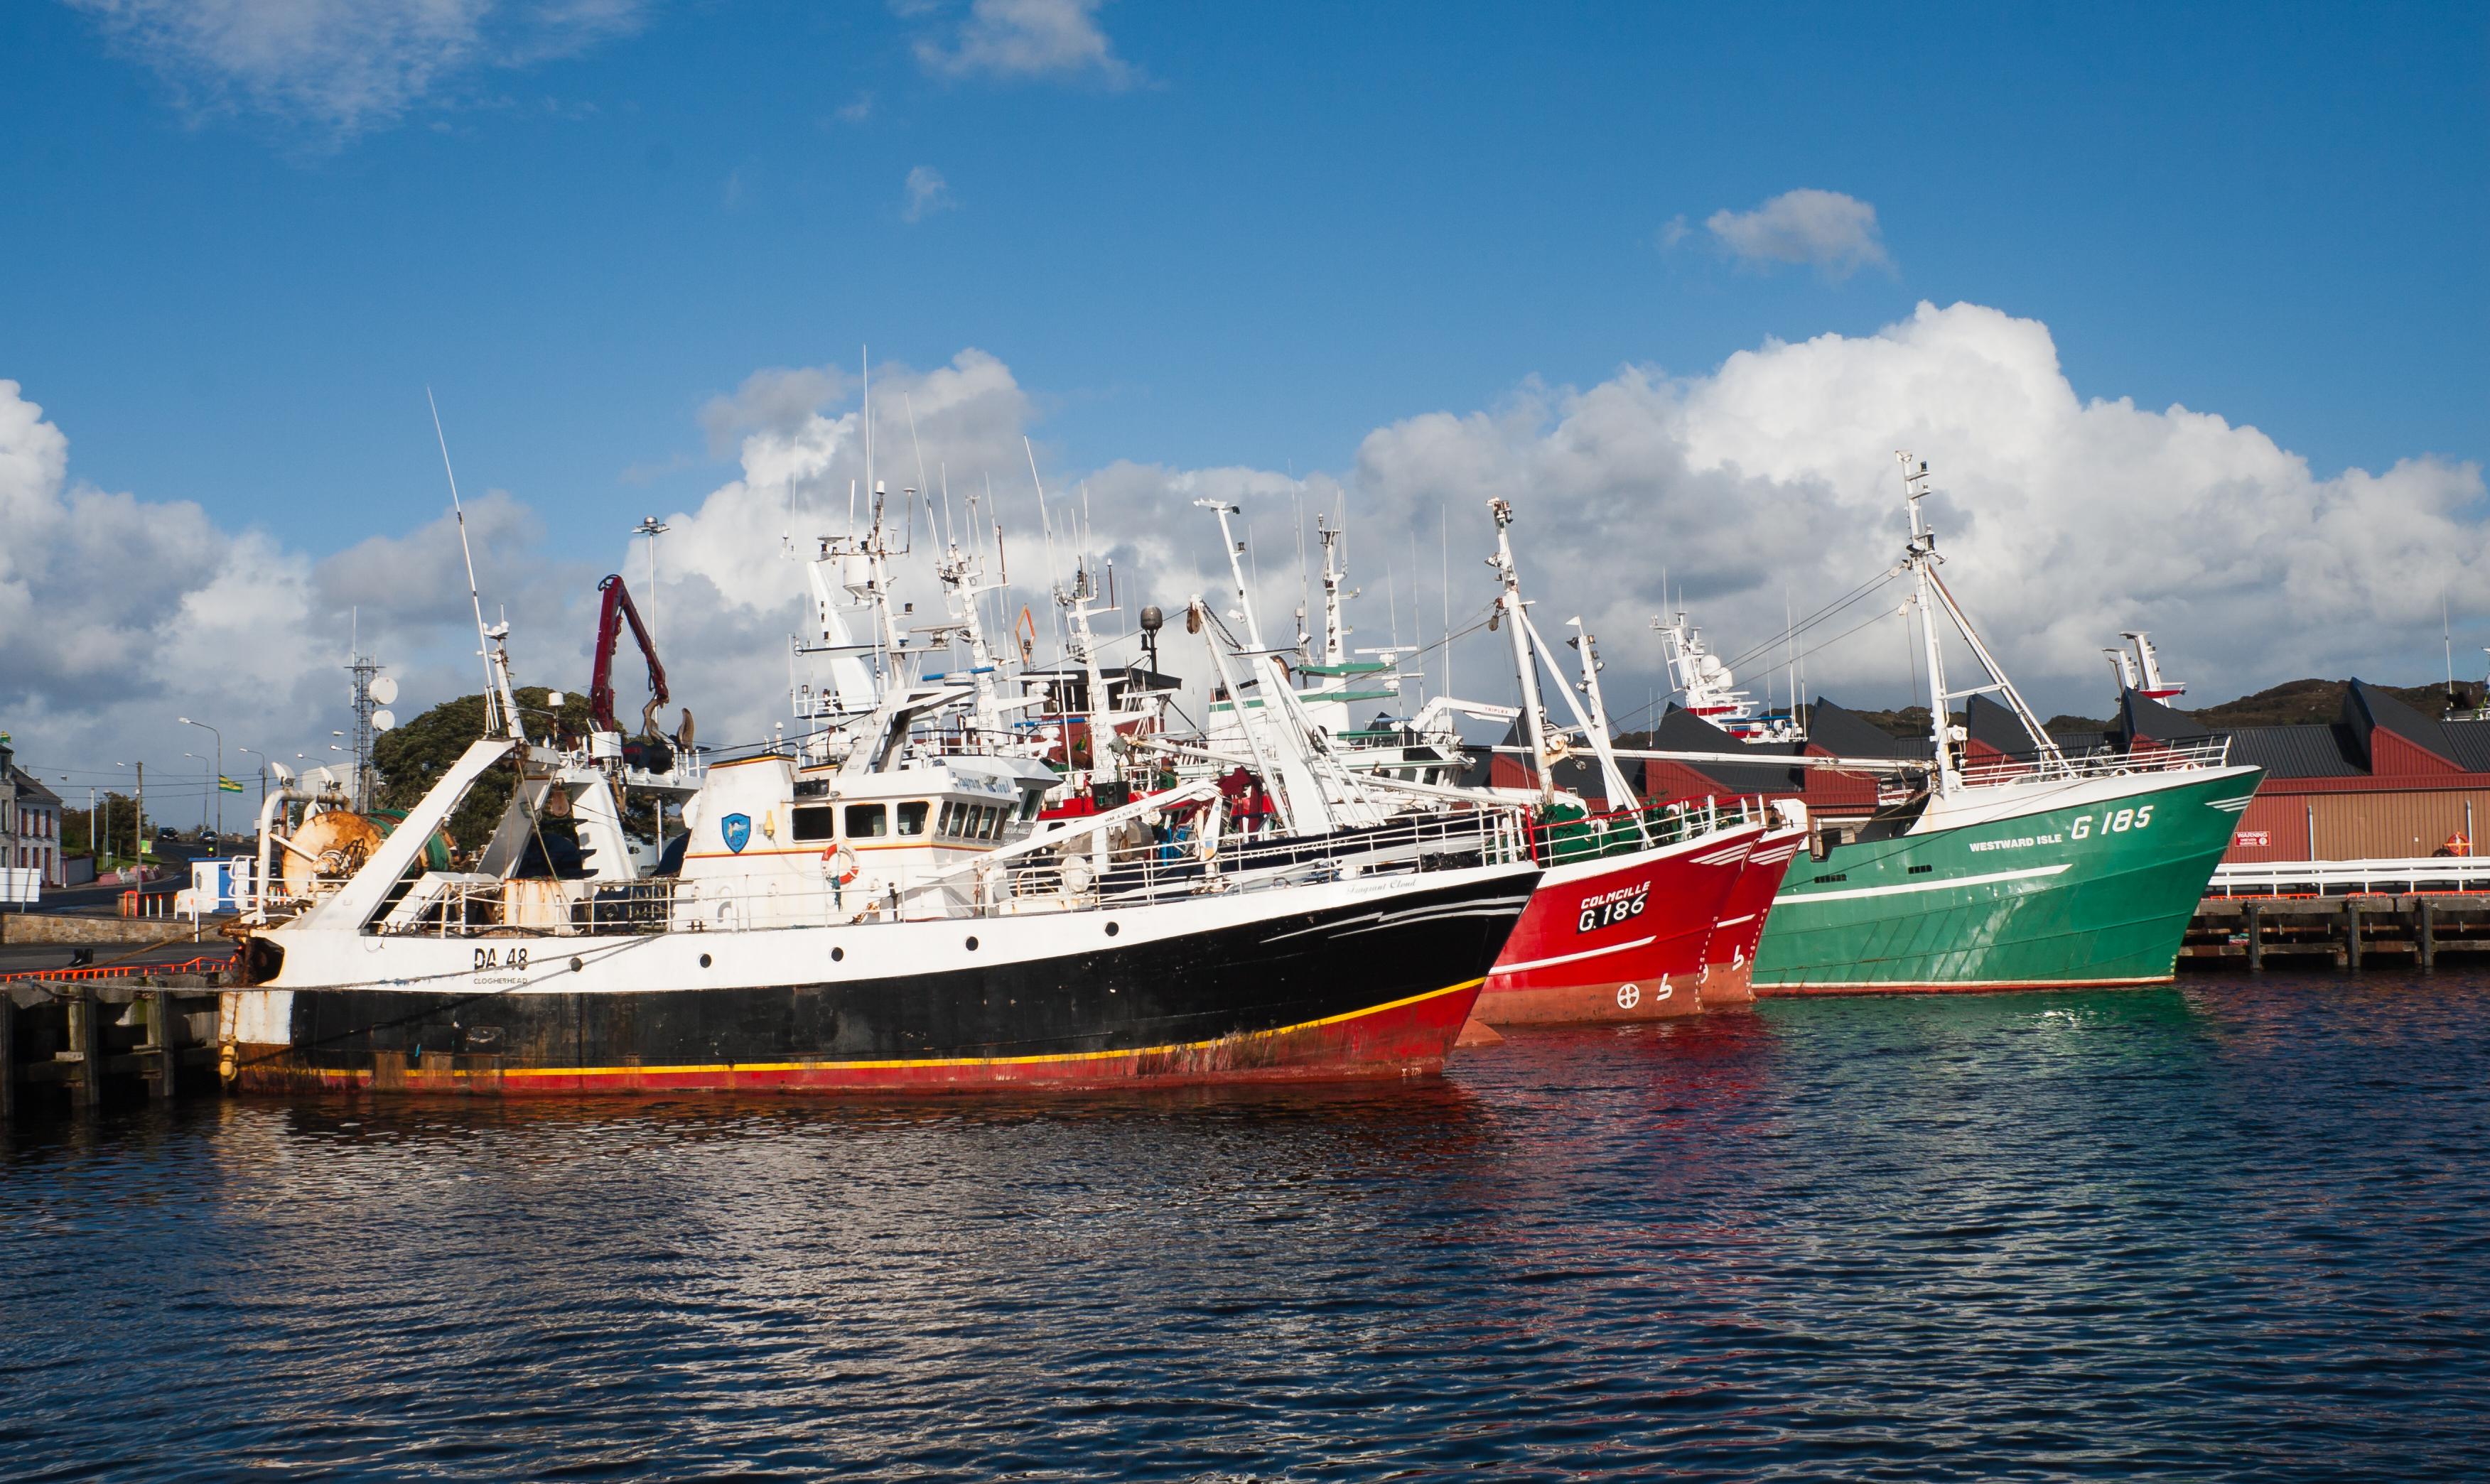 File:Killybegs Harbour Fishing Trawlers 2012 09 16.jpg - Wikimedia Commons